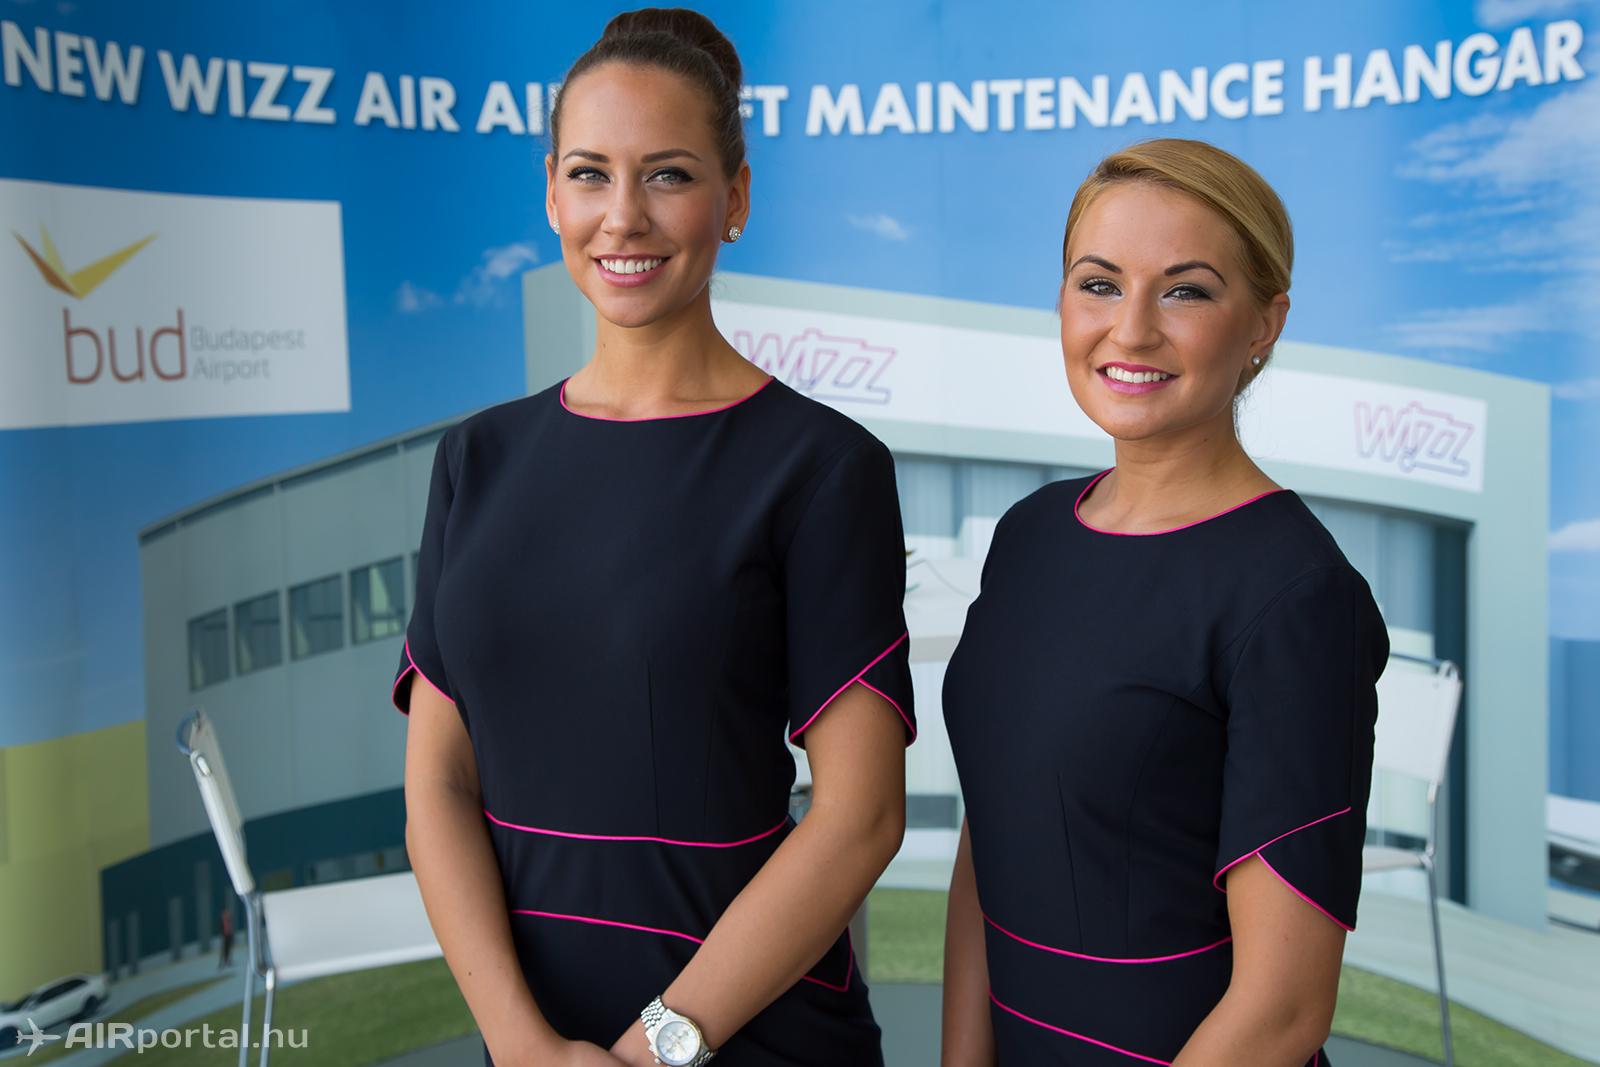 Wizz nagykövetek akcióban. (Fotó: Airportal.hu) | © AIRportal.hu